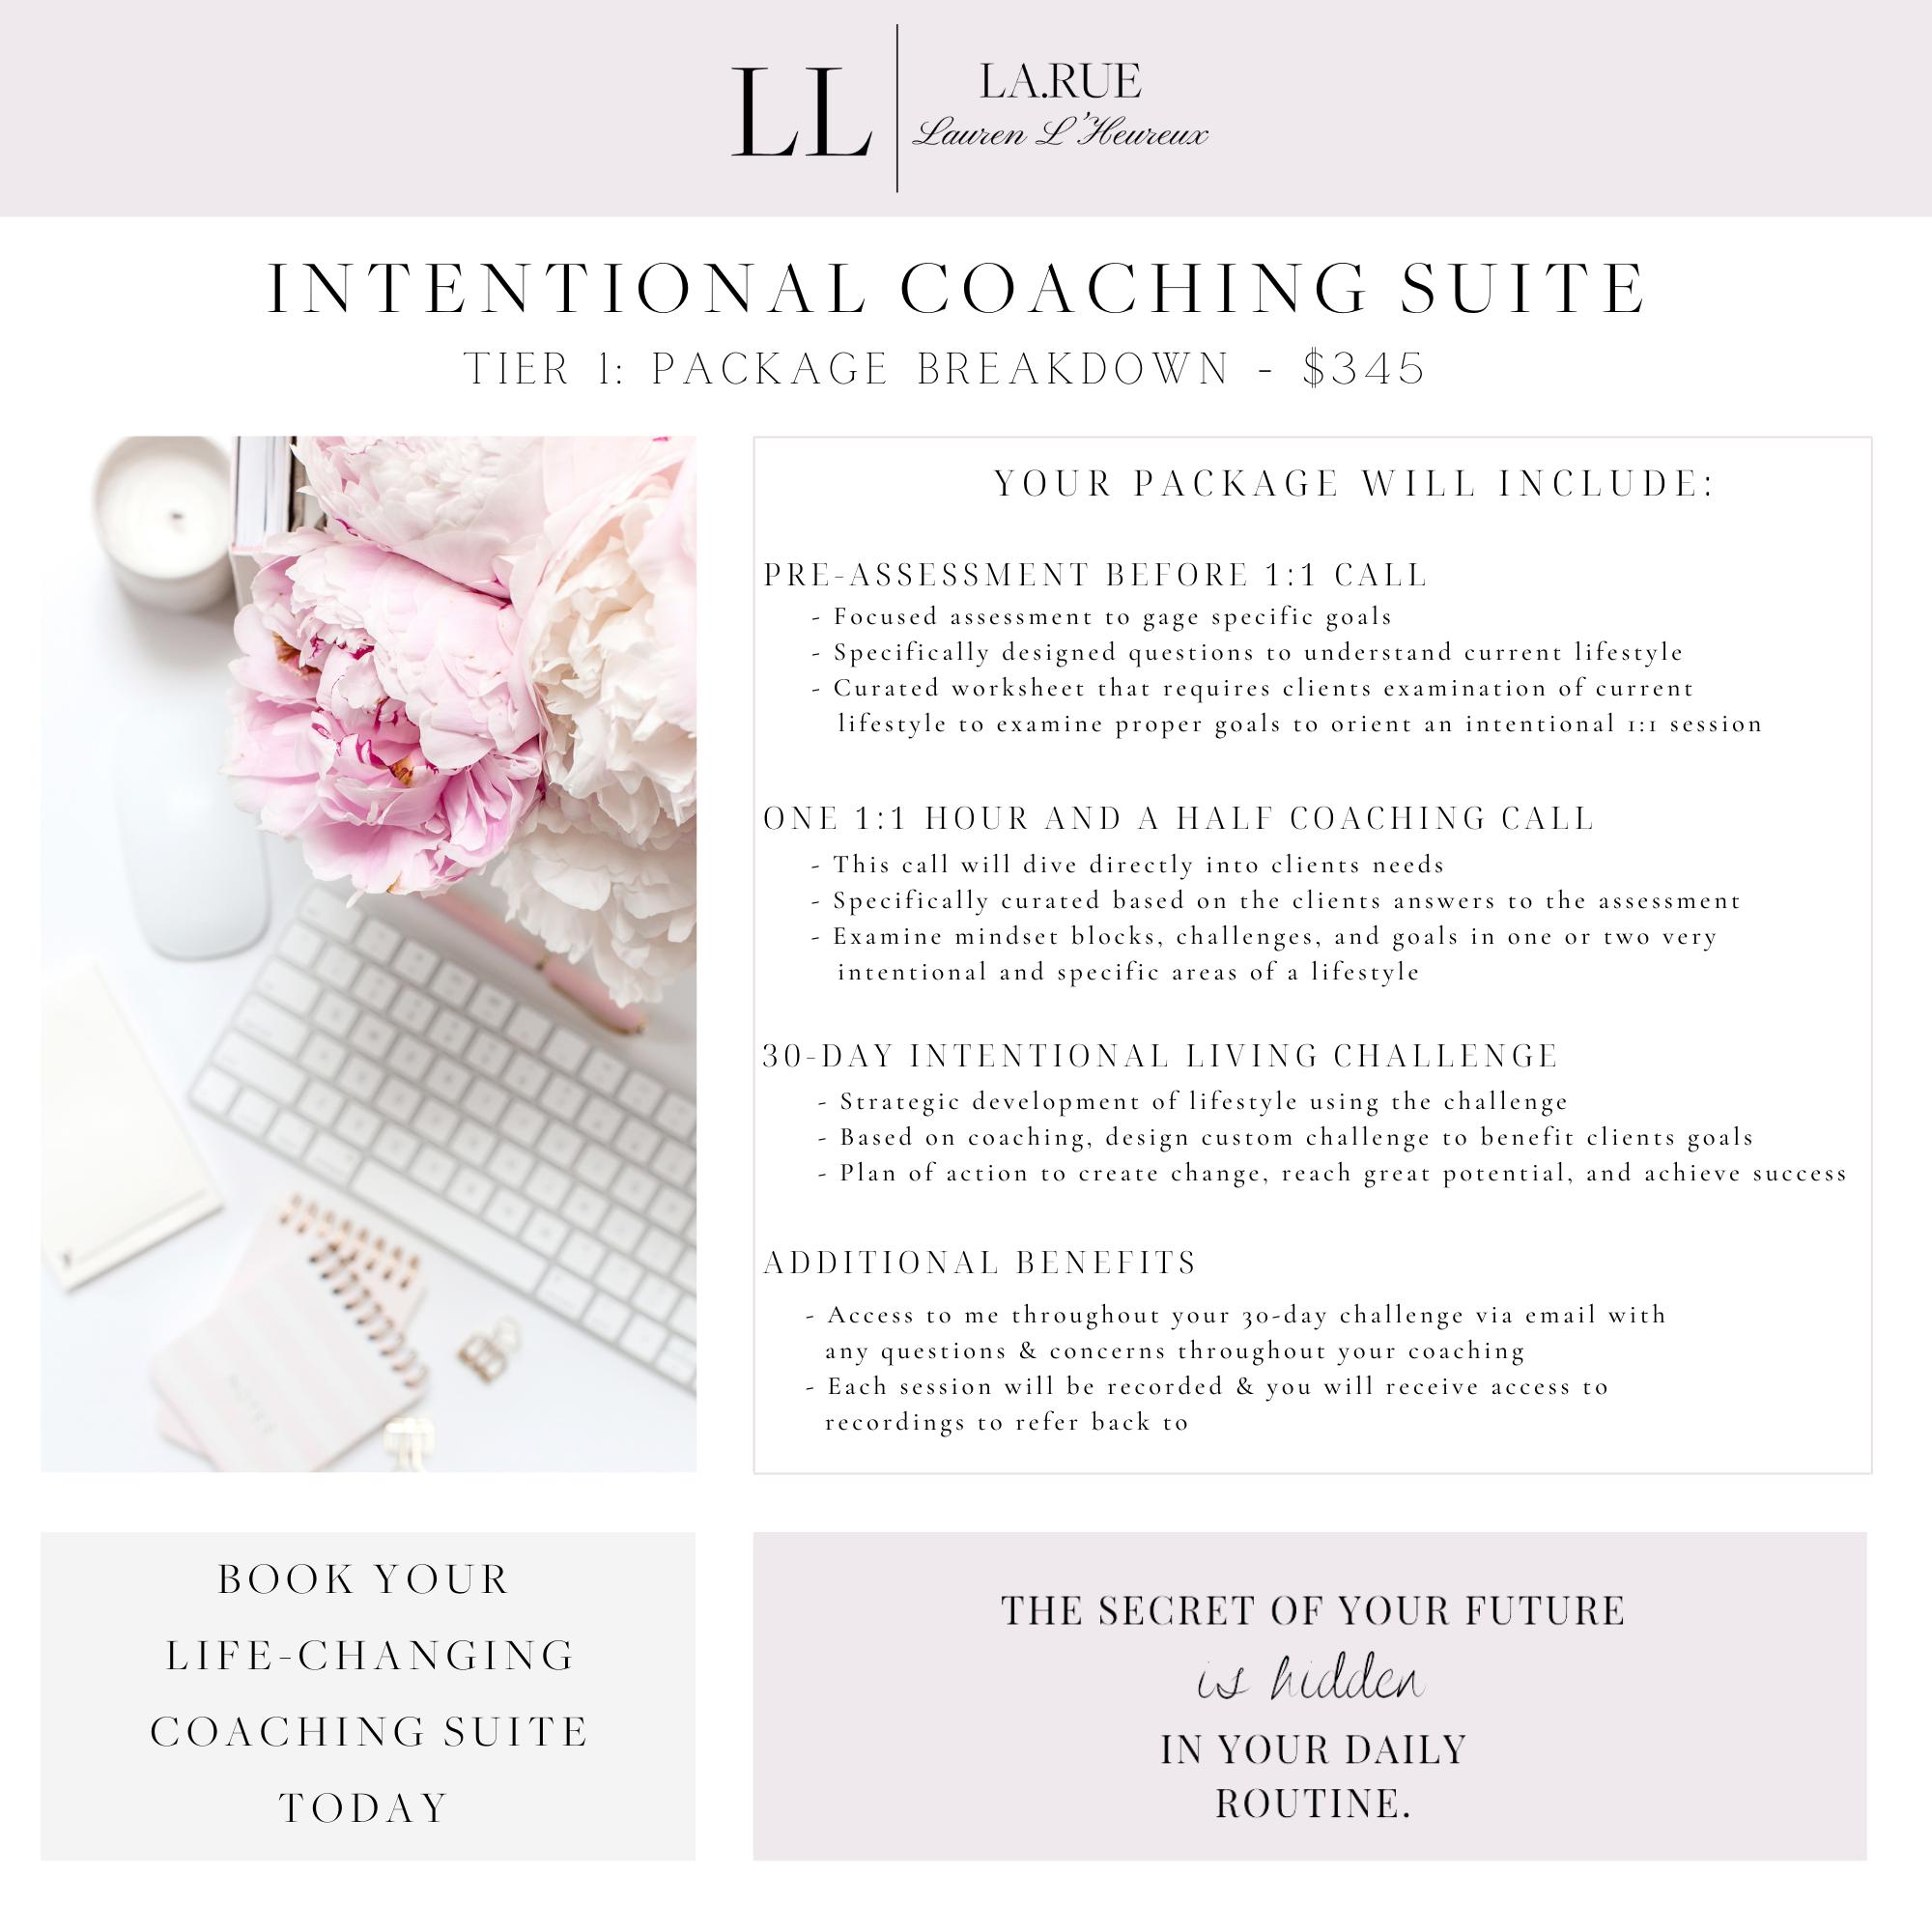 Intentional Lifestyle Coaching